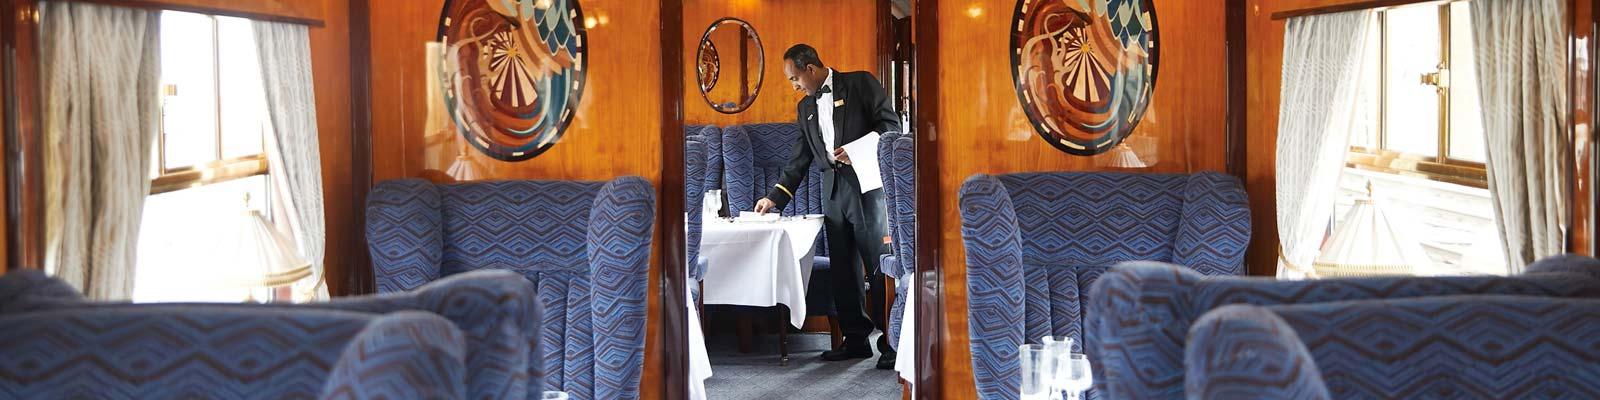 British Pullman Luxury Train Journeys